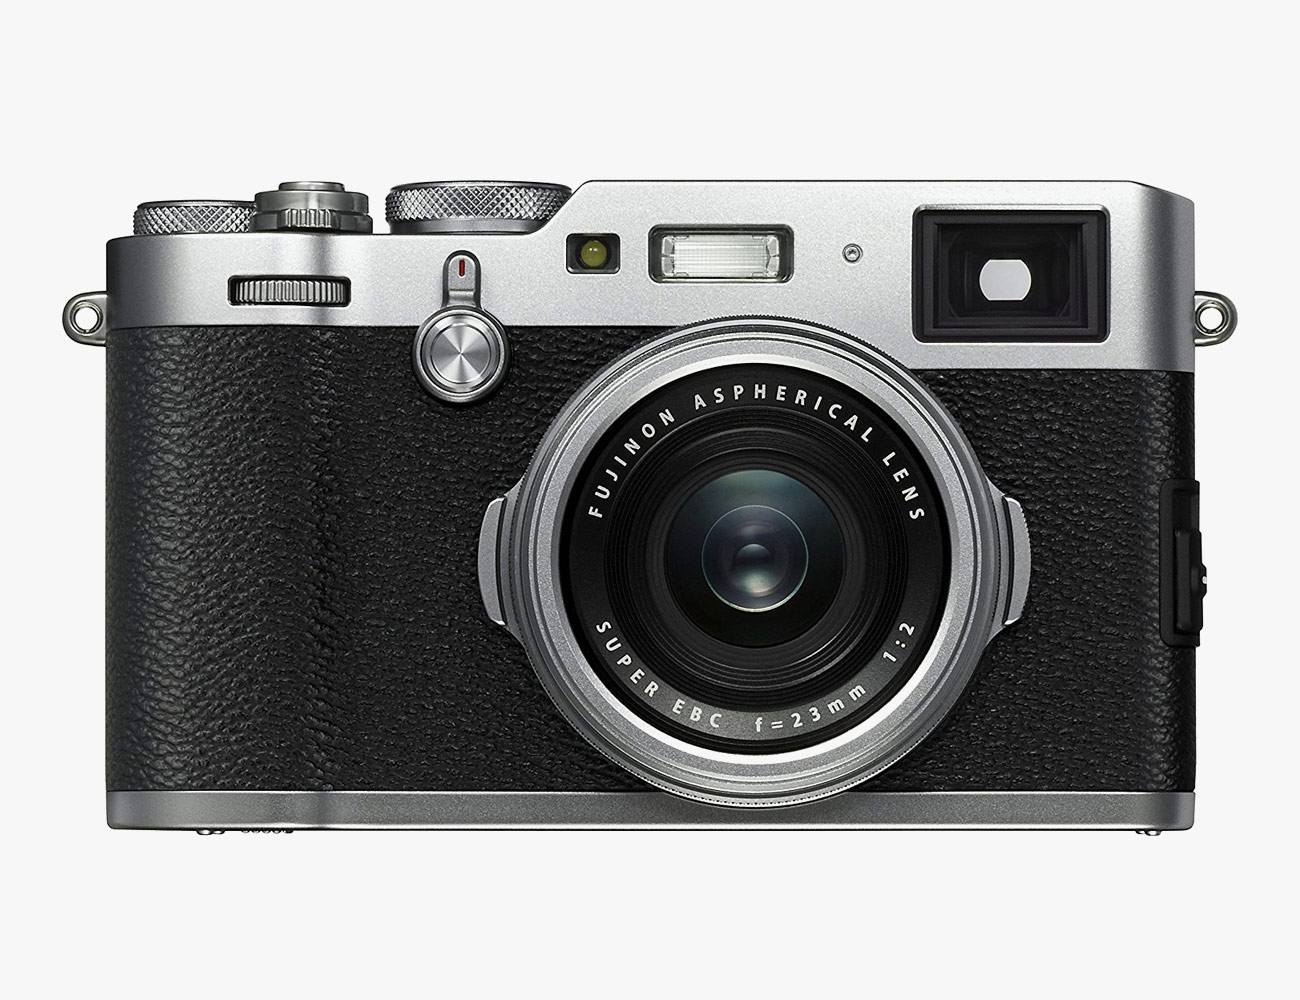 Sensor: 24MP X-Trans CMOS sensor  Lens: 35mm equivalent F2 lens  Unique Features: physical aperture control ring, wide angle lens, great image quality